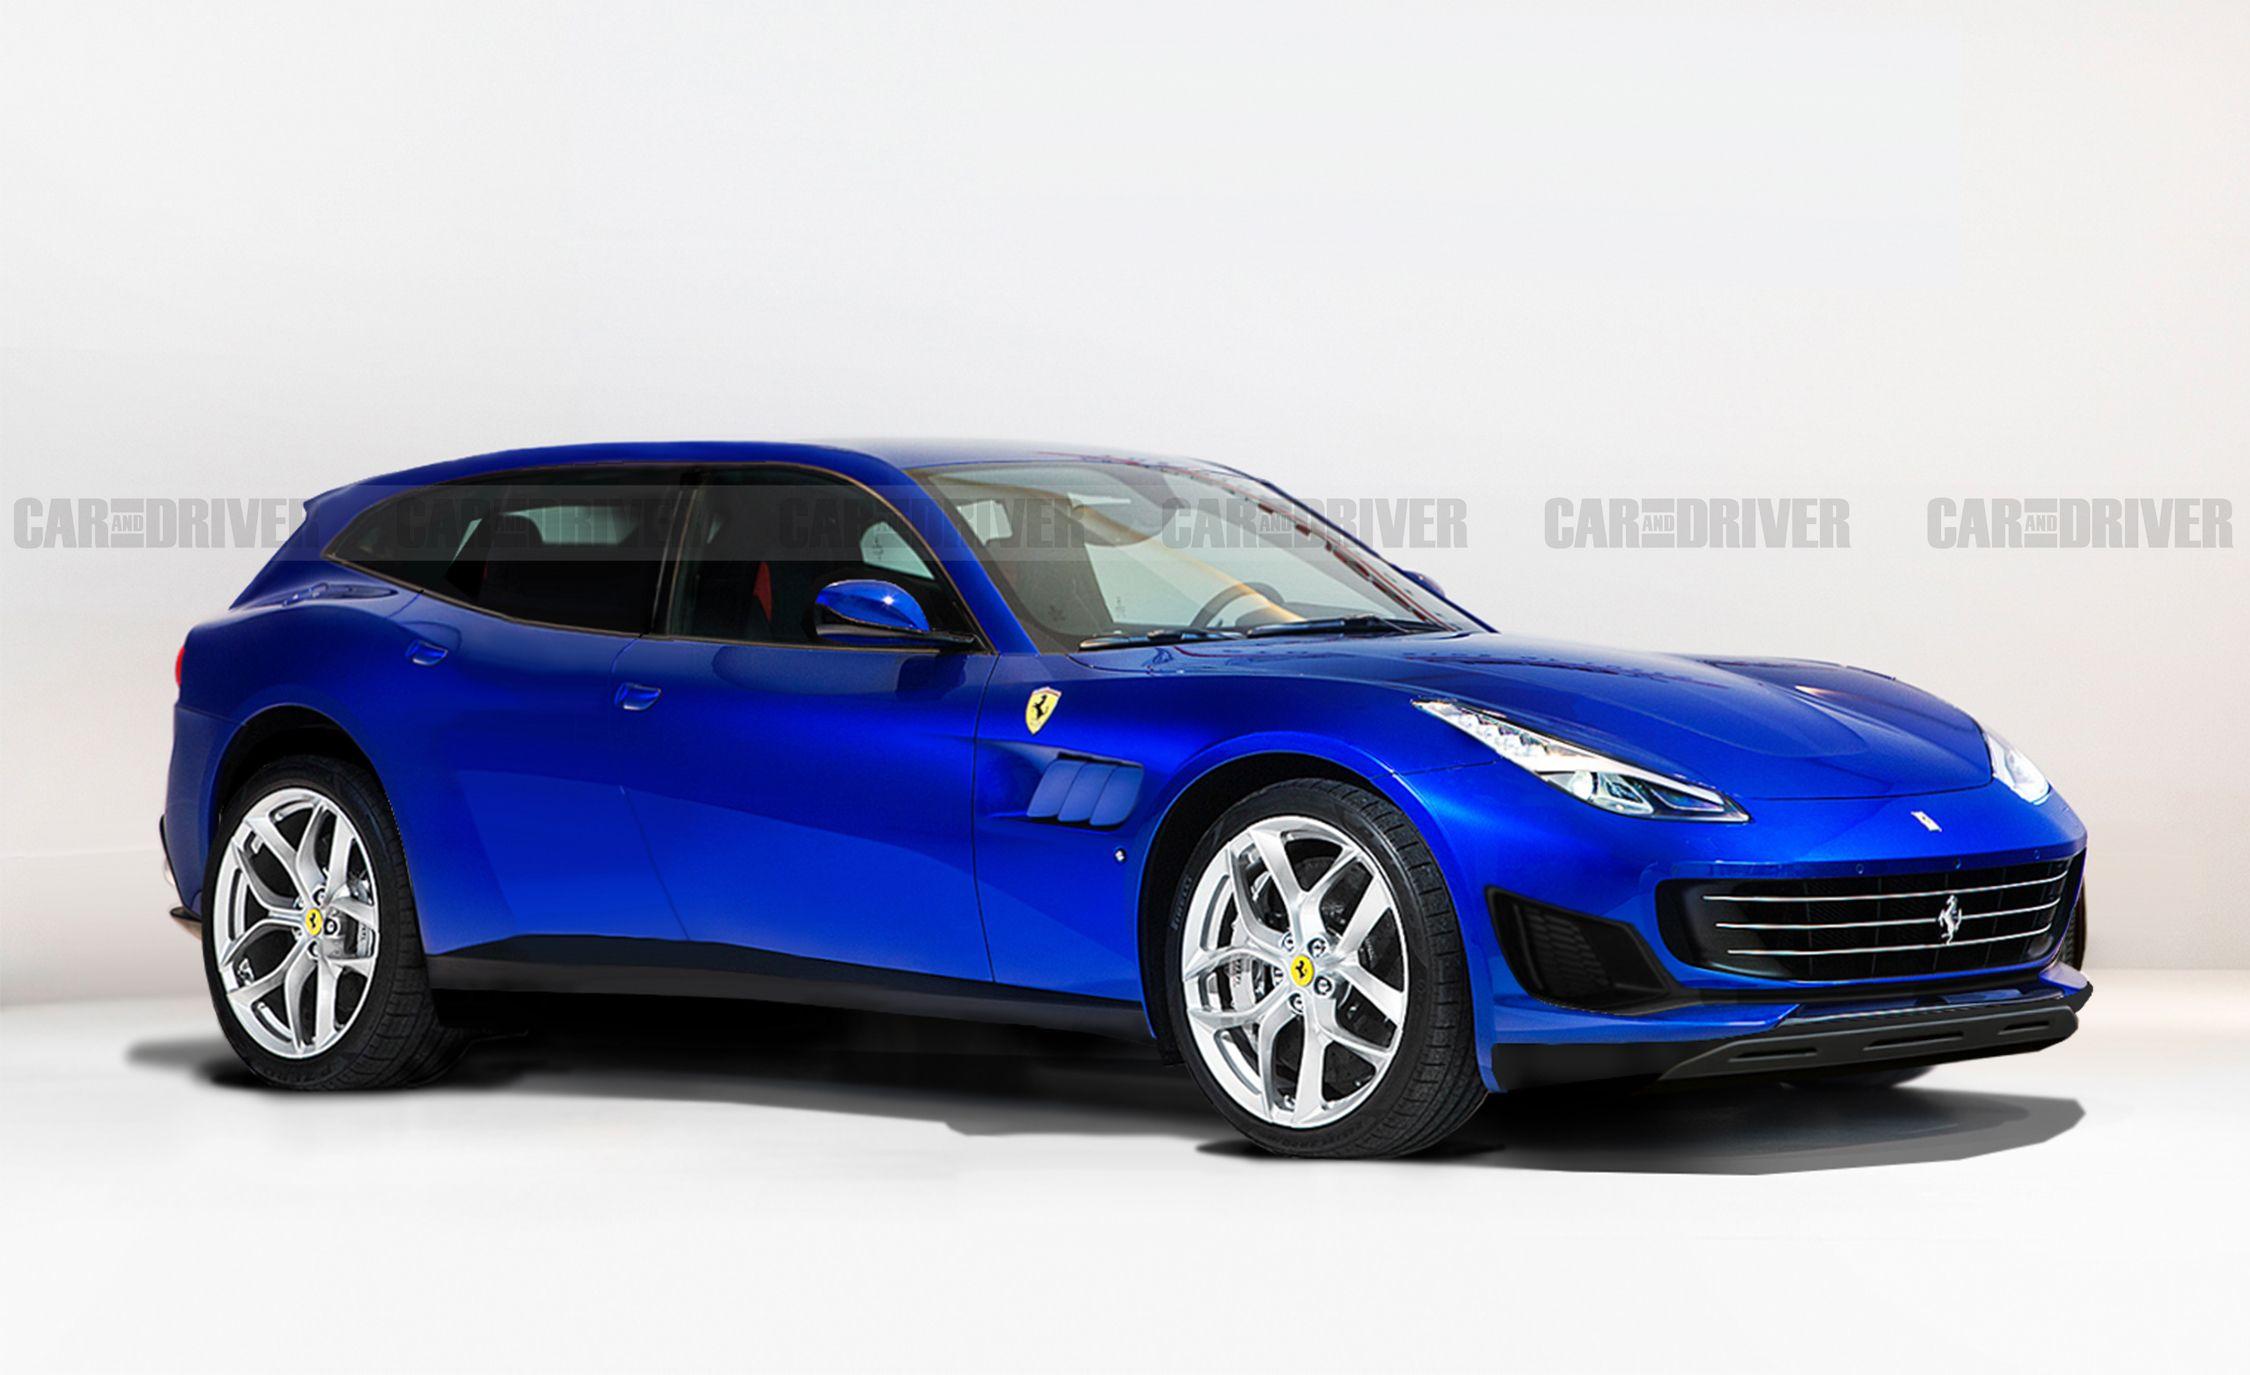 Ferrari Finally Going Suv With Purosangue Hybrid Crossover By 2022